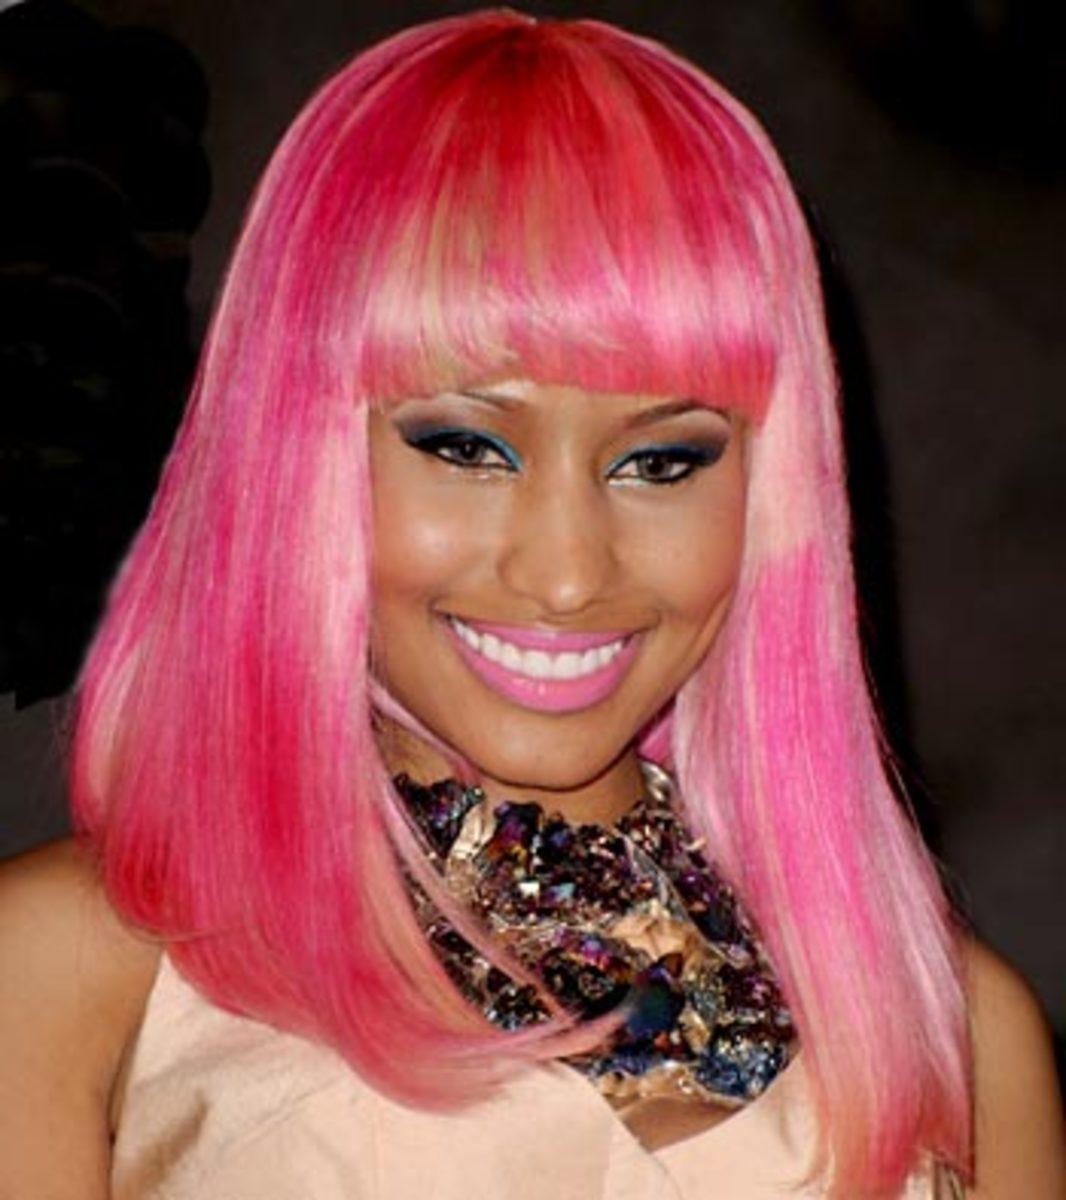 Nicki Minaj in a Pink and Blonde Wig